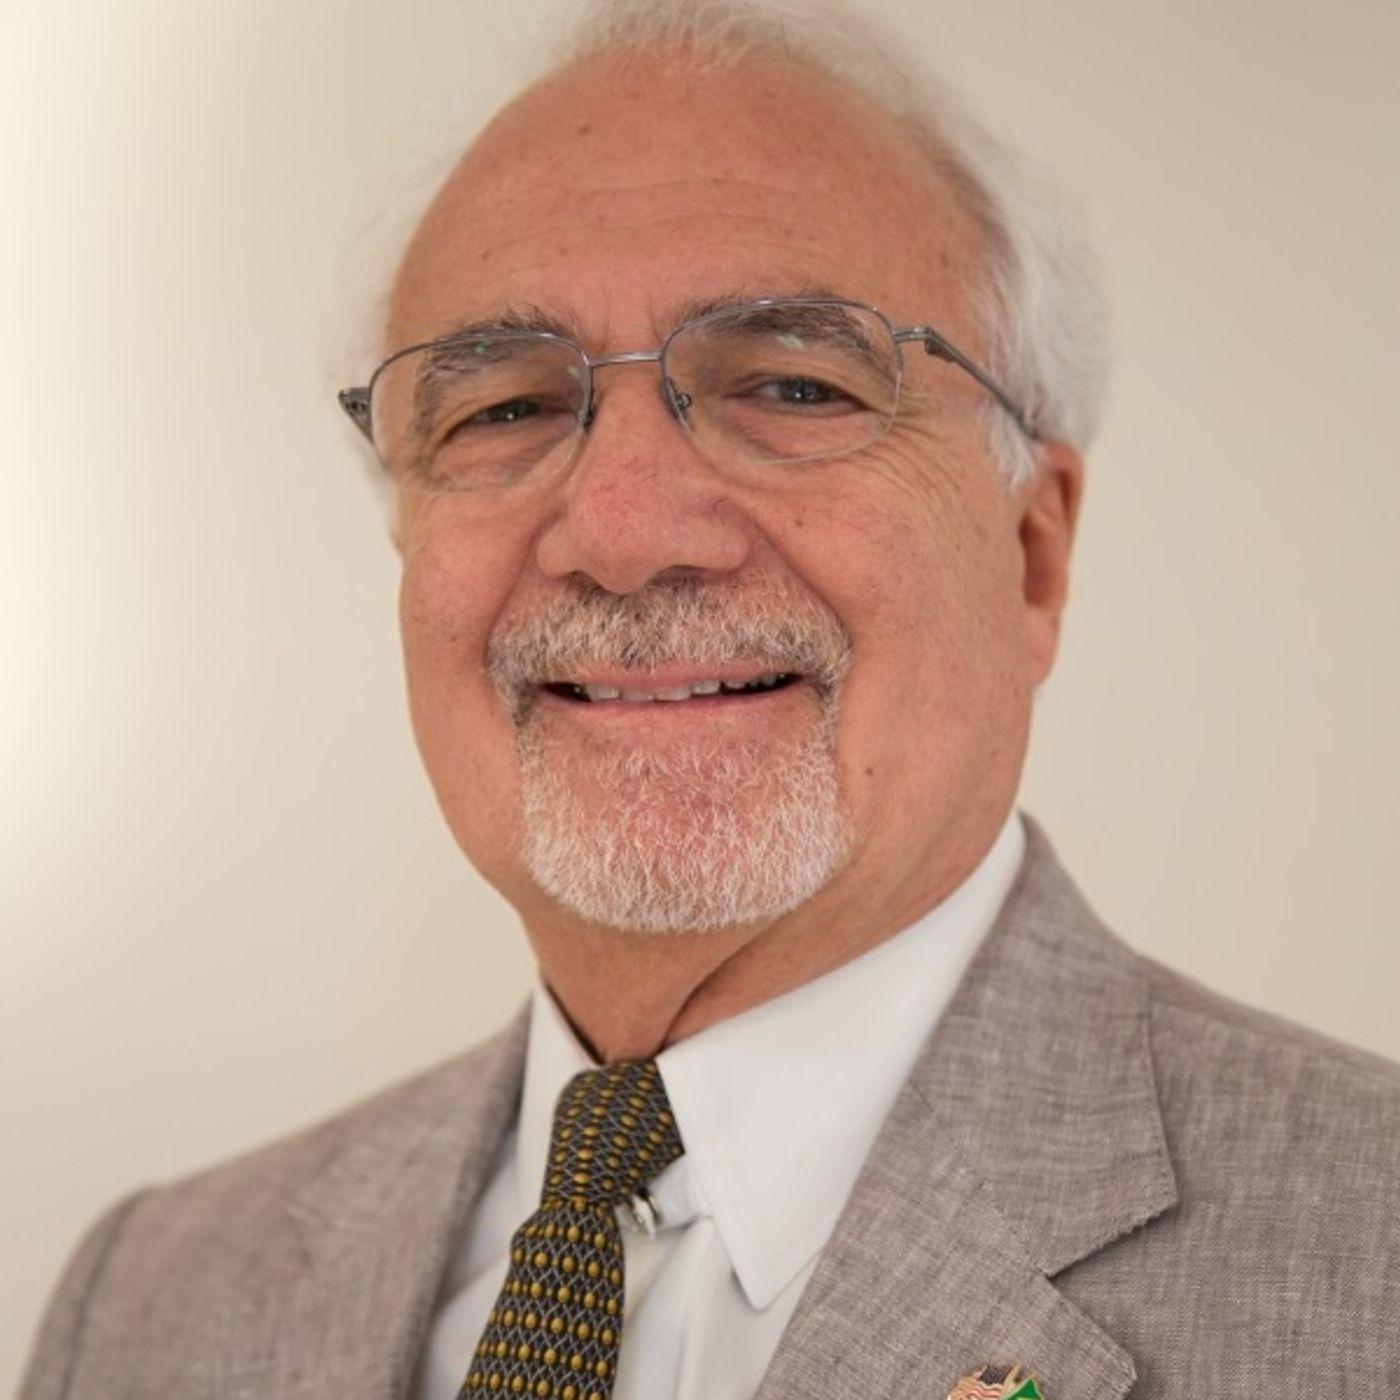 Carlo Barbieri, CEO Oxford Group